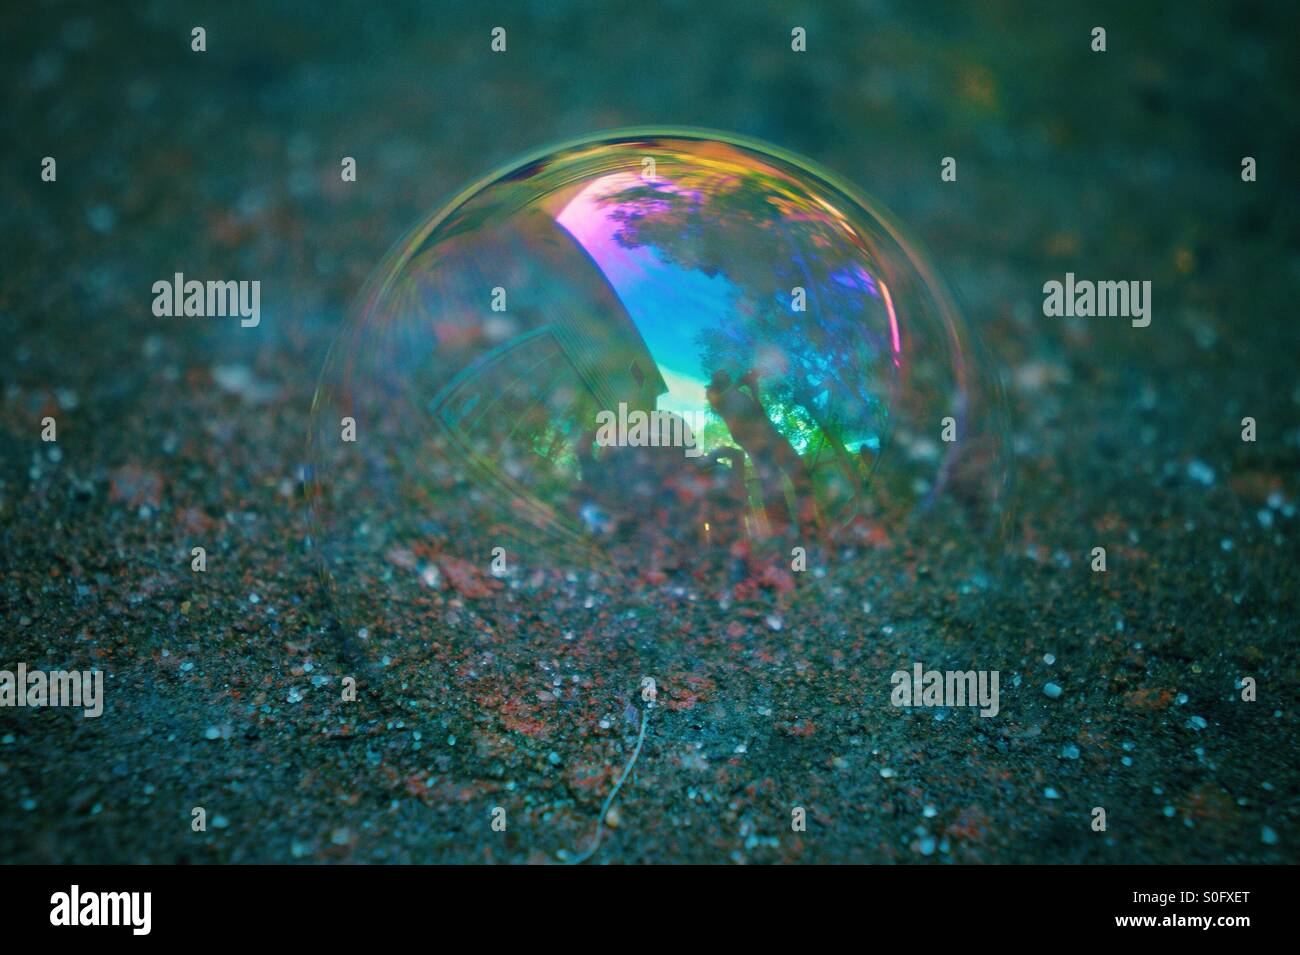 Bubble-Spaß Stockfoto